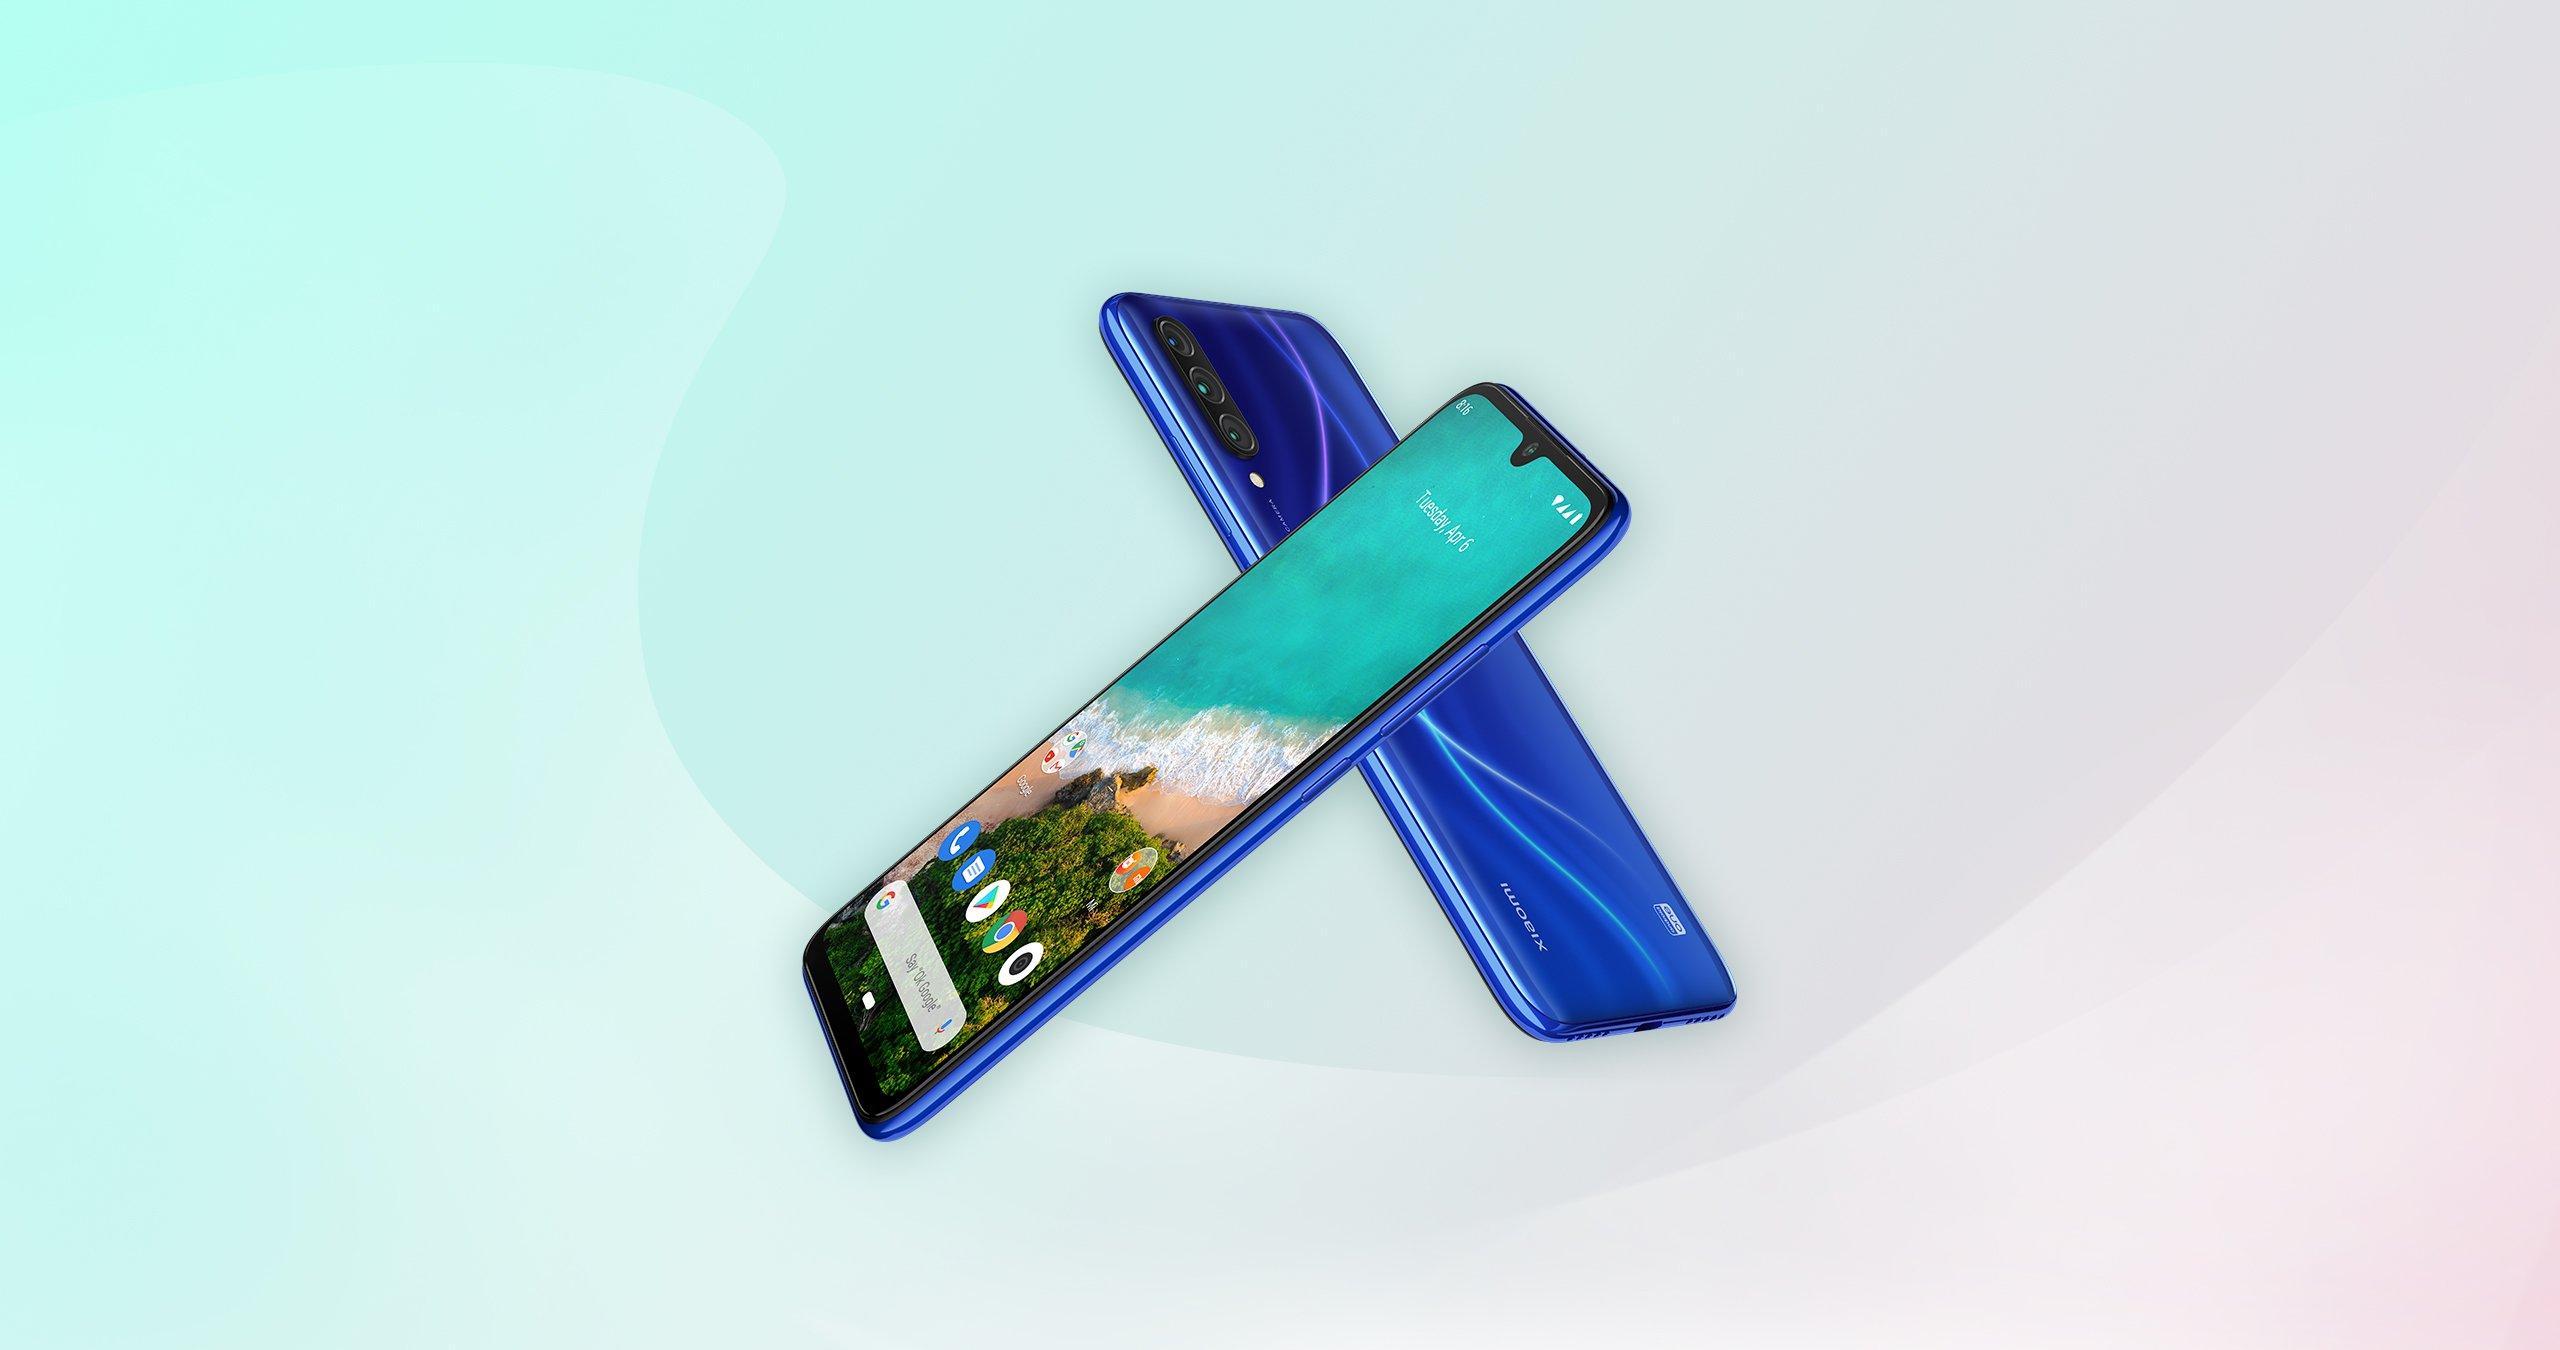 Smartphone Mi A3 - 4+128GB - Albastră